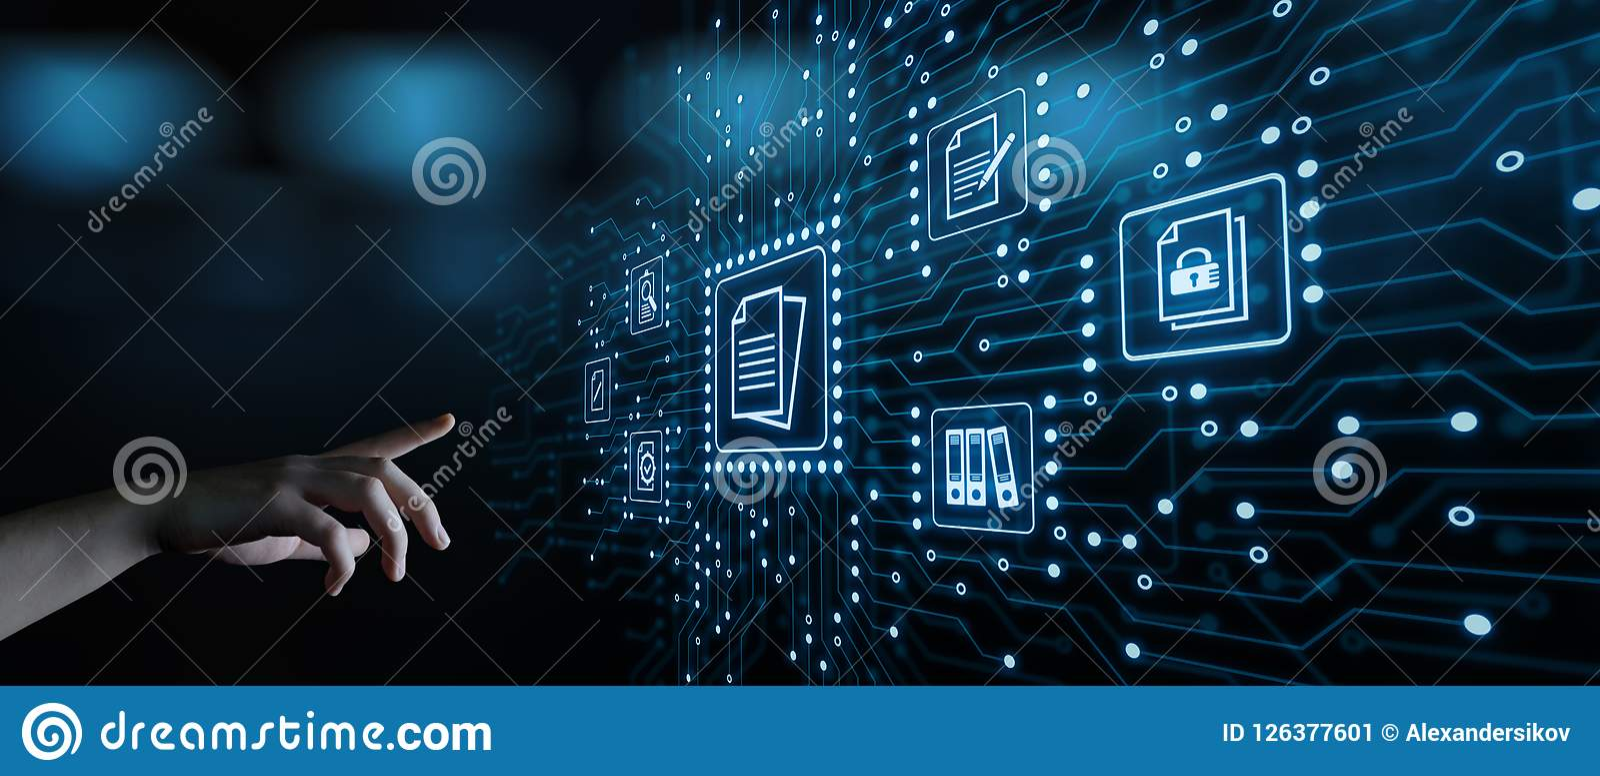 Technology Management Image: Document Management Data System Business Internet